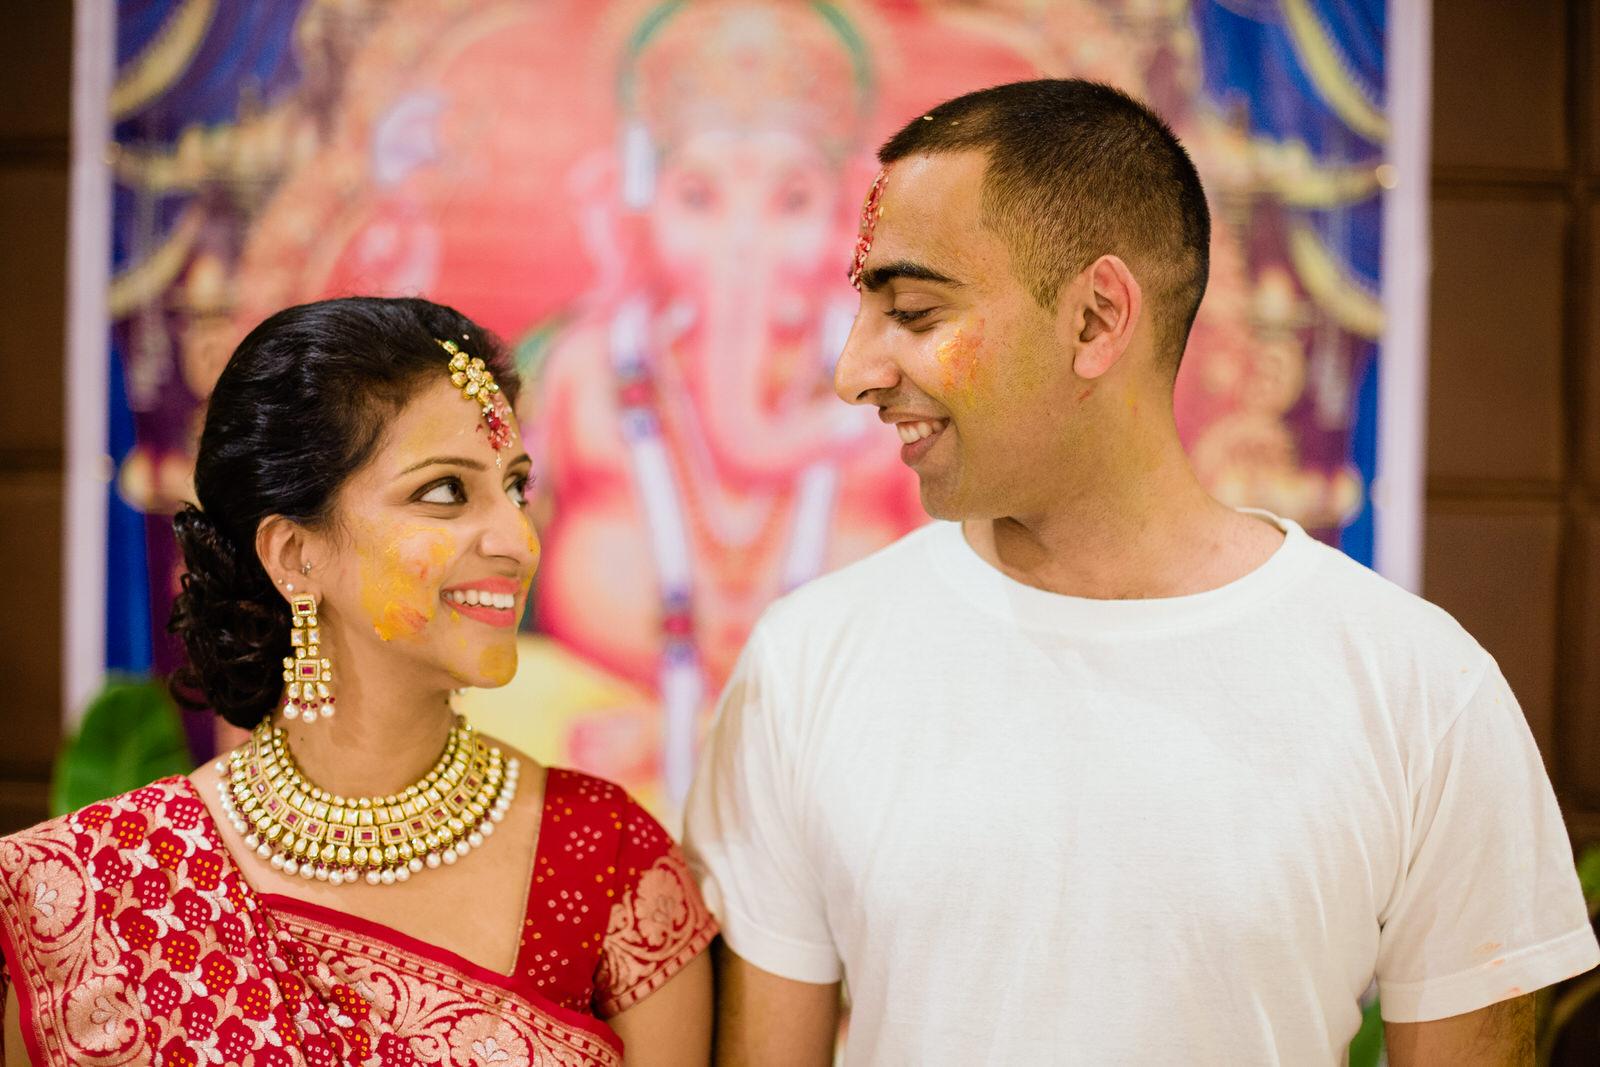 destination-wedding-photographer-Kerala-india-14.JPG